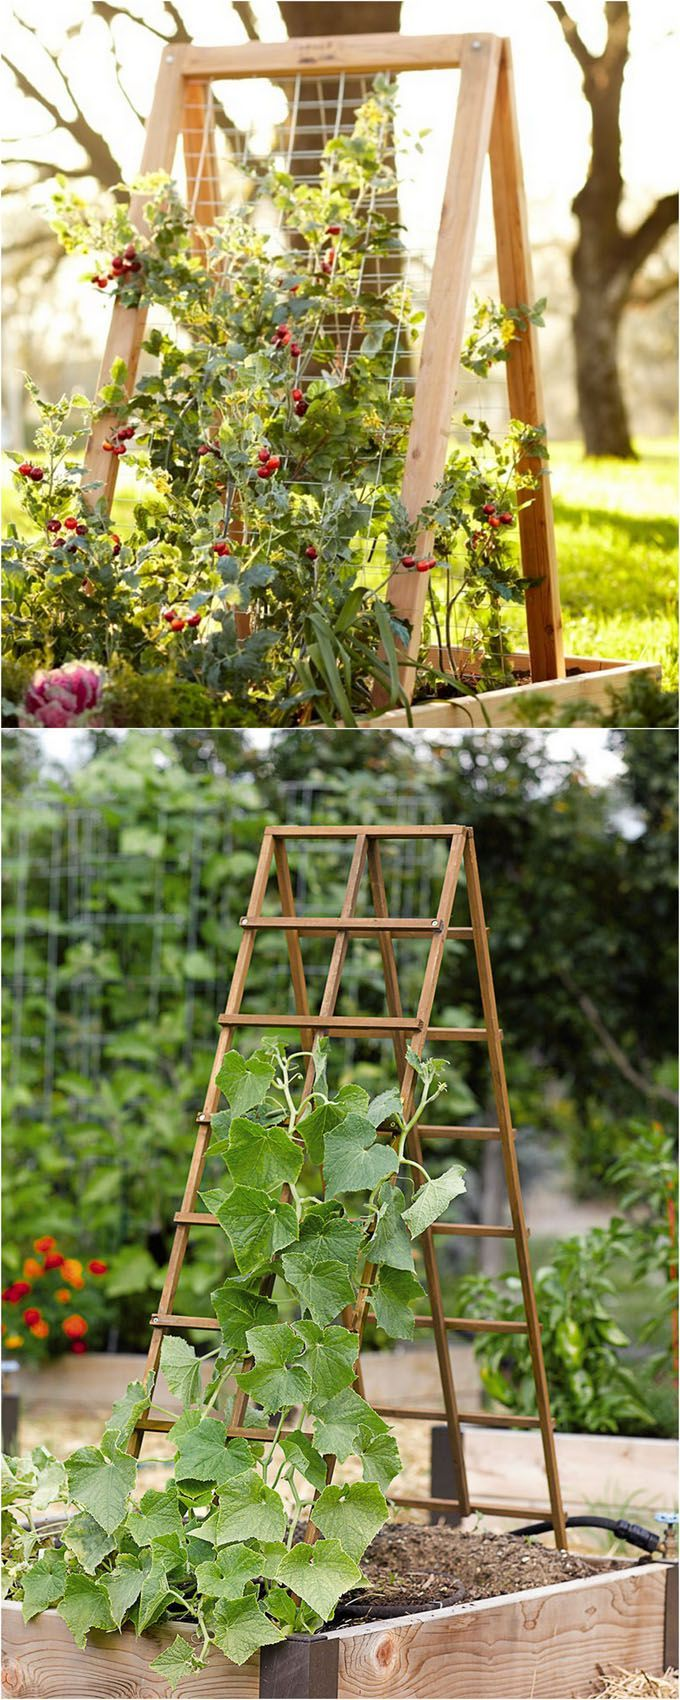 Garden decor trellis   Easy DIY Trellis u Vertical Garden Structures  Garden structures